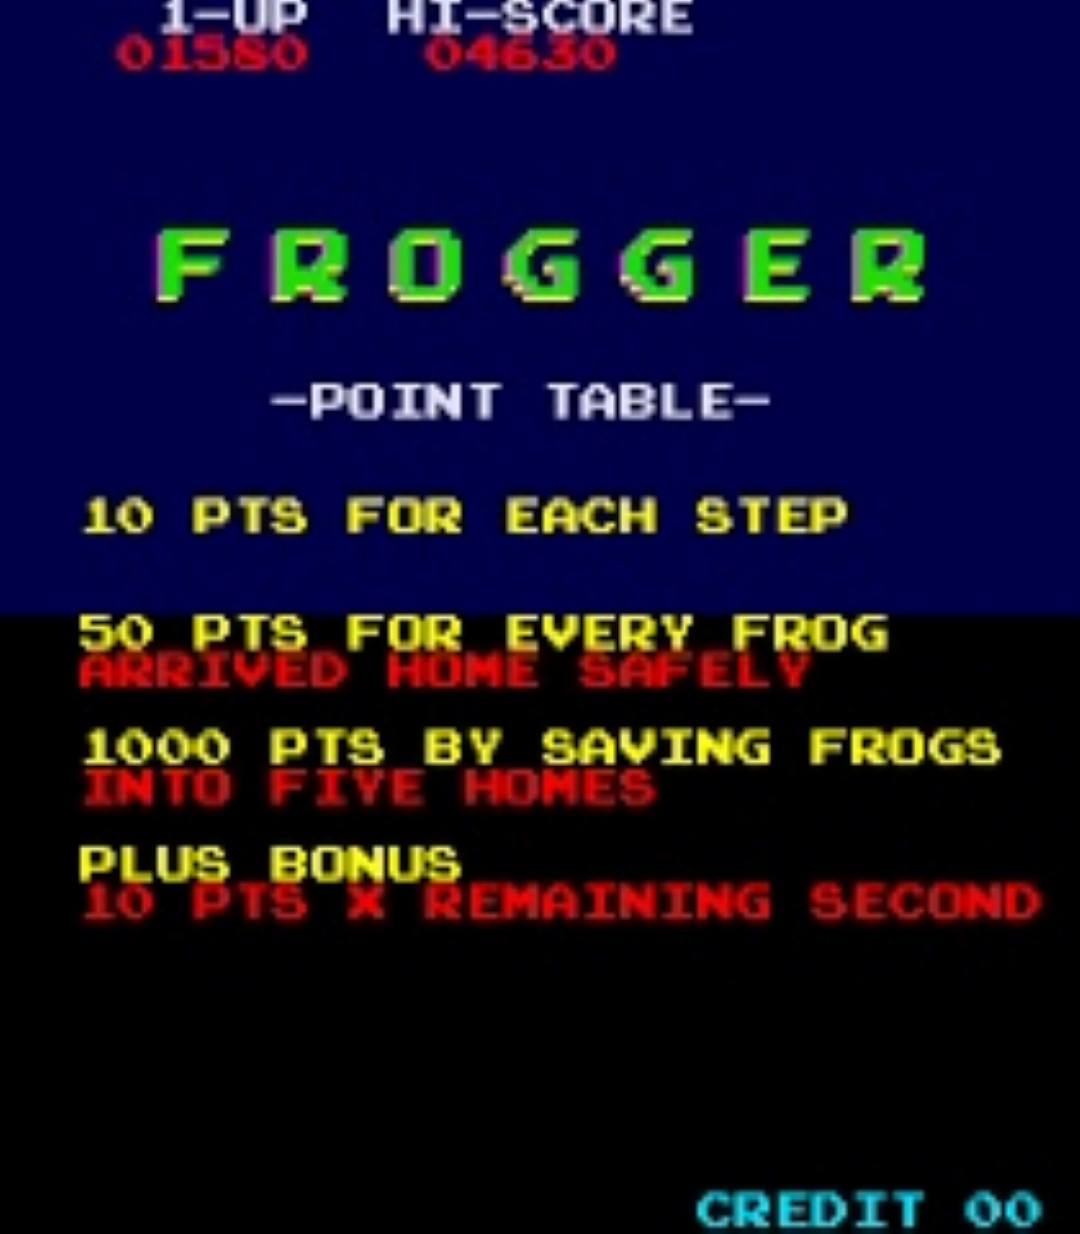 Frogger Arcade Pcb bootleg repair [27.01.2021]